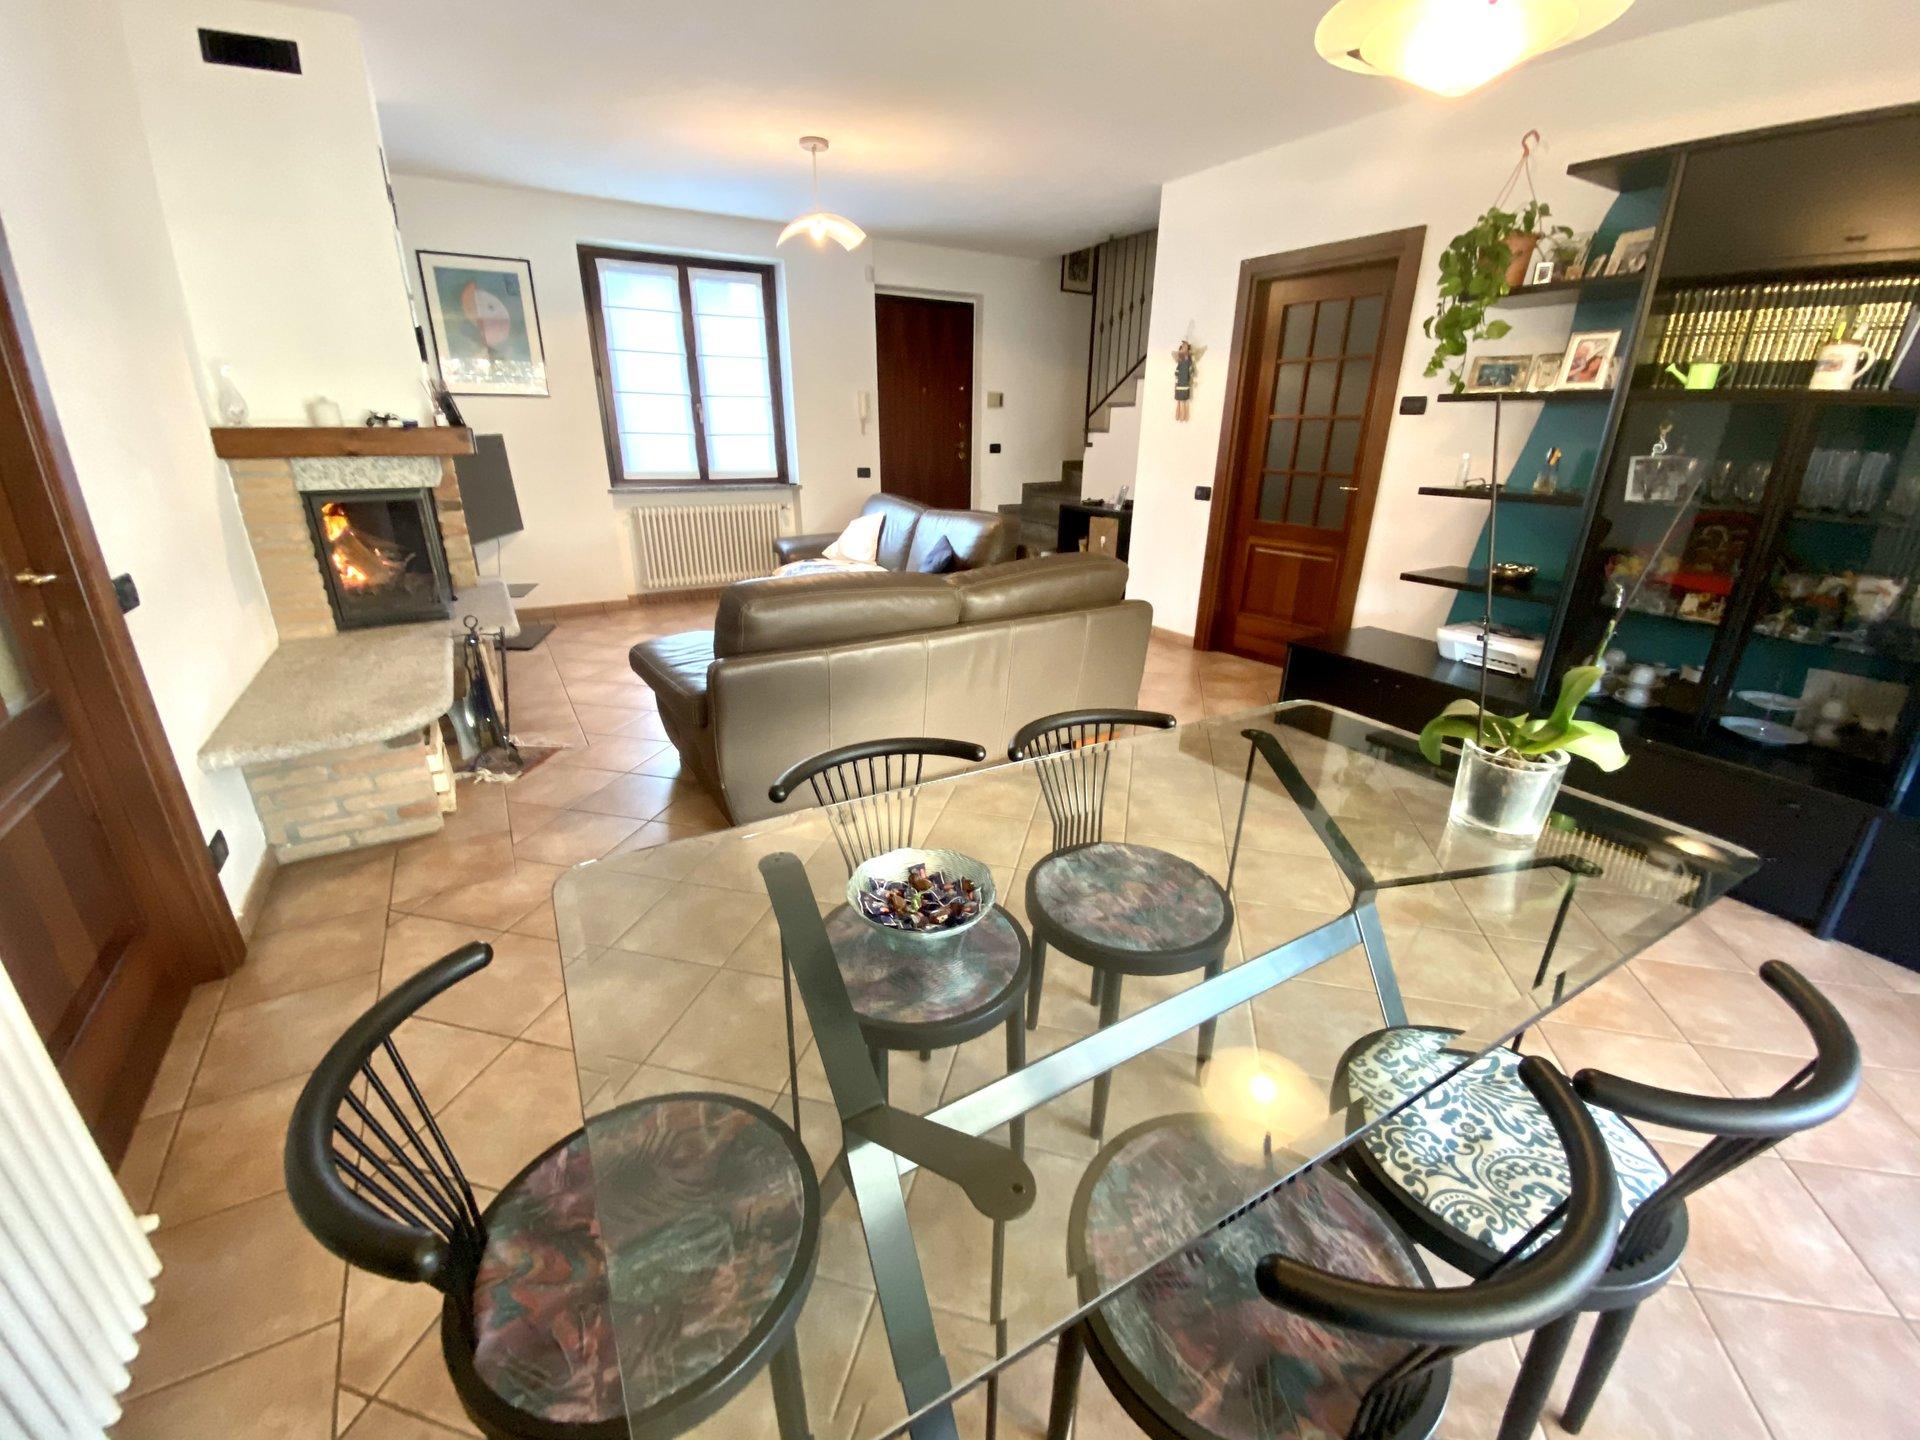 Sale Villa - Montorfano Campeggio Montorfano - Italy